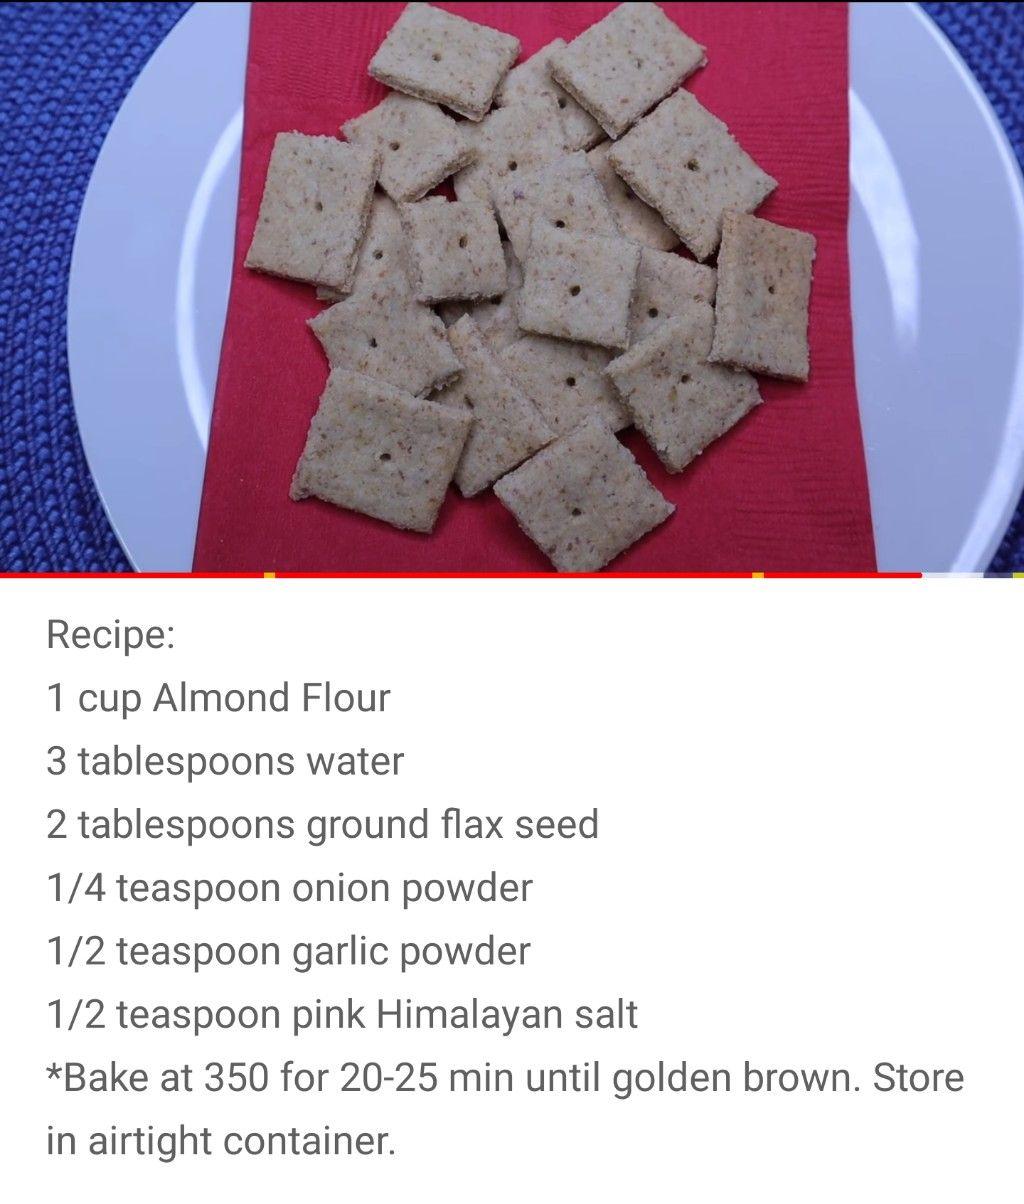 Keto Crackers By Kristi Davis Keto Recipes Recipes Keto Diet Recipes